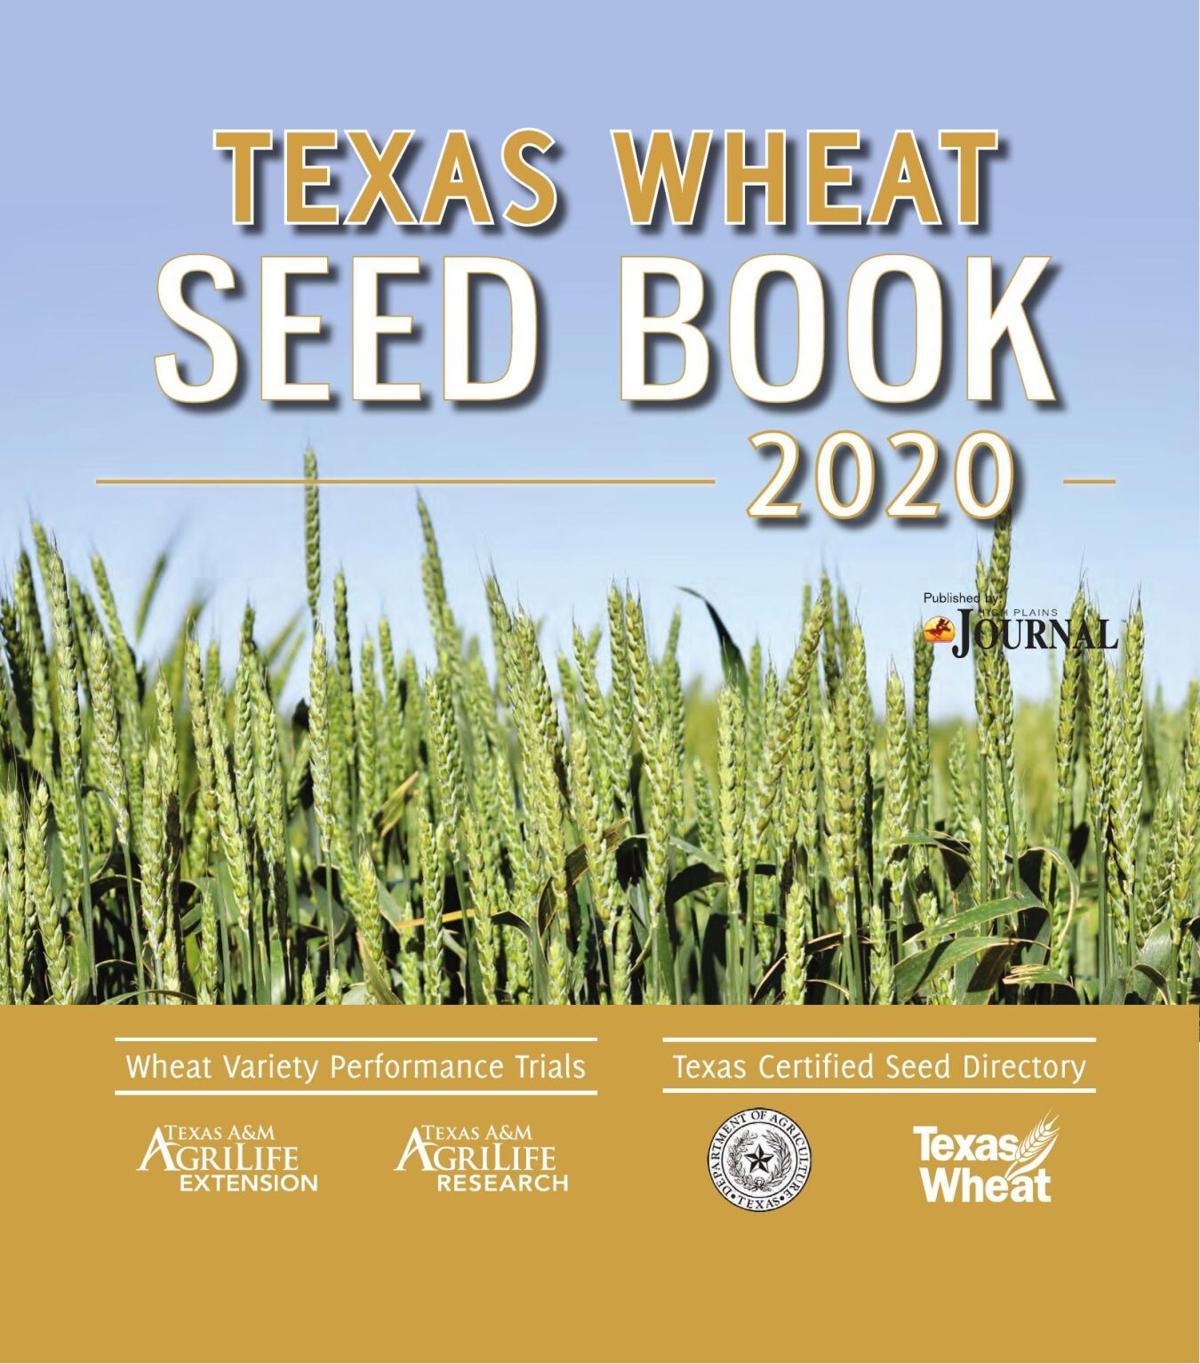 2020 Texas Wheat Book